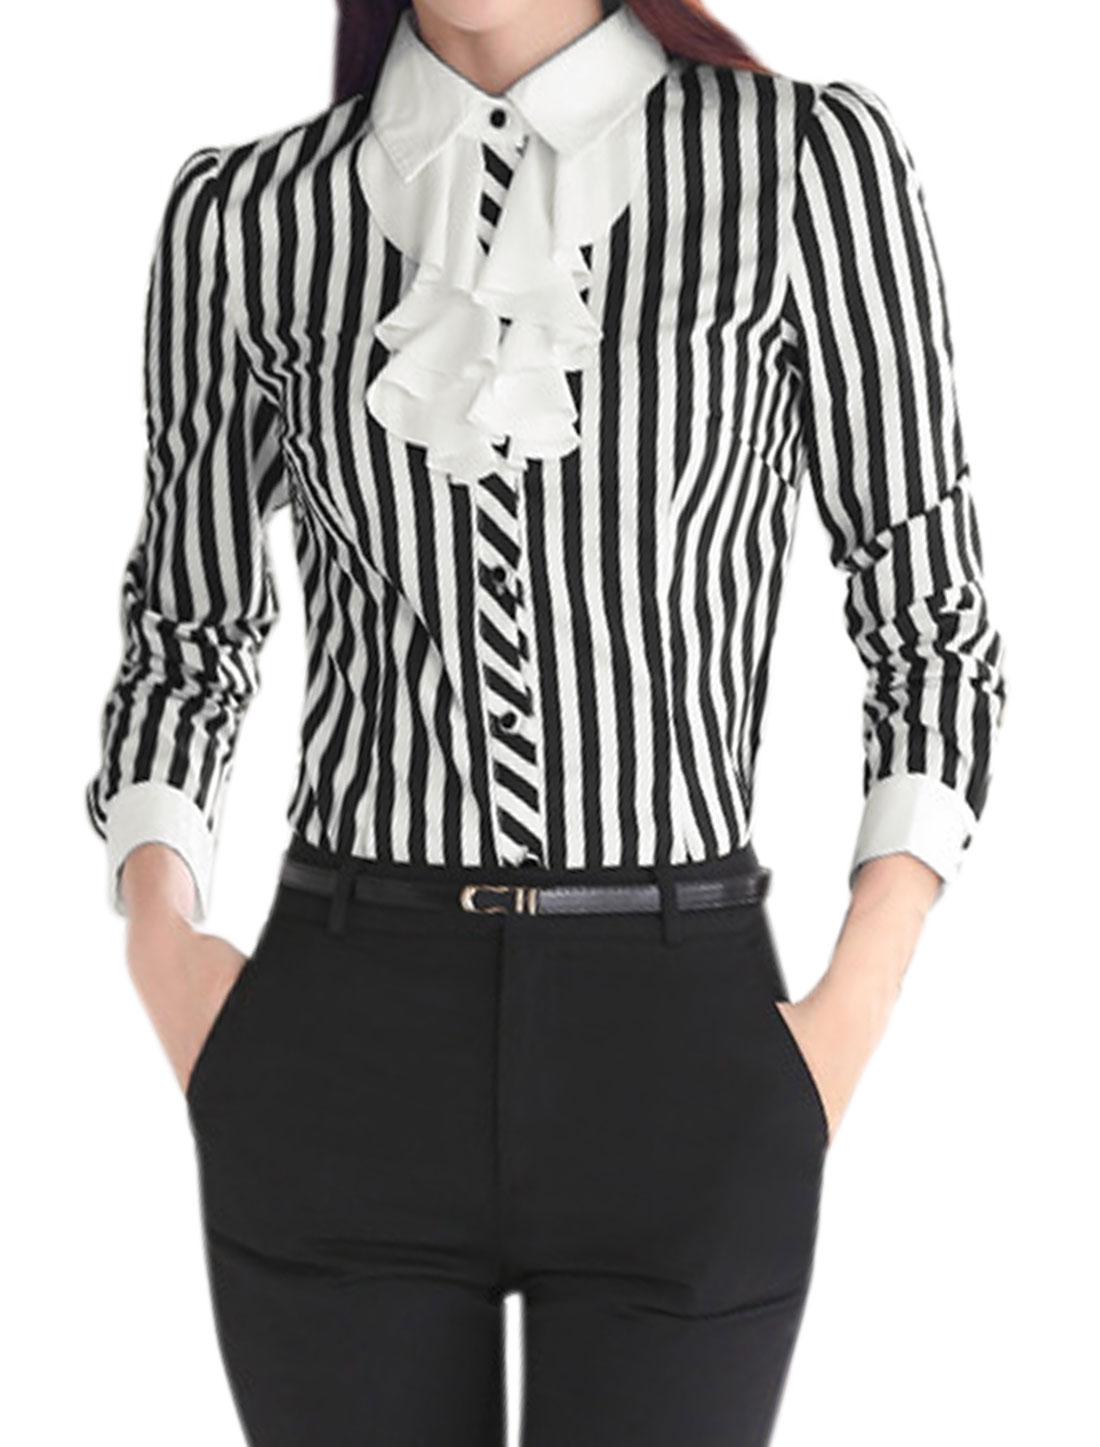 Women Buttoned Ruffled Front Slim Fit Stripes Shirt Black L